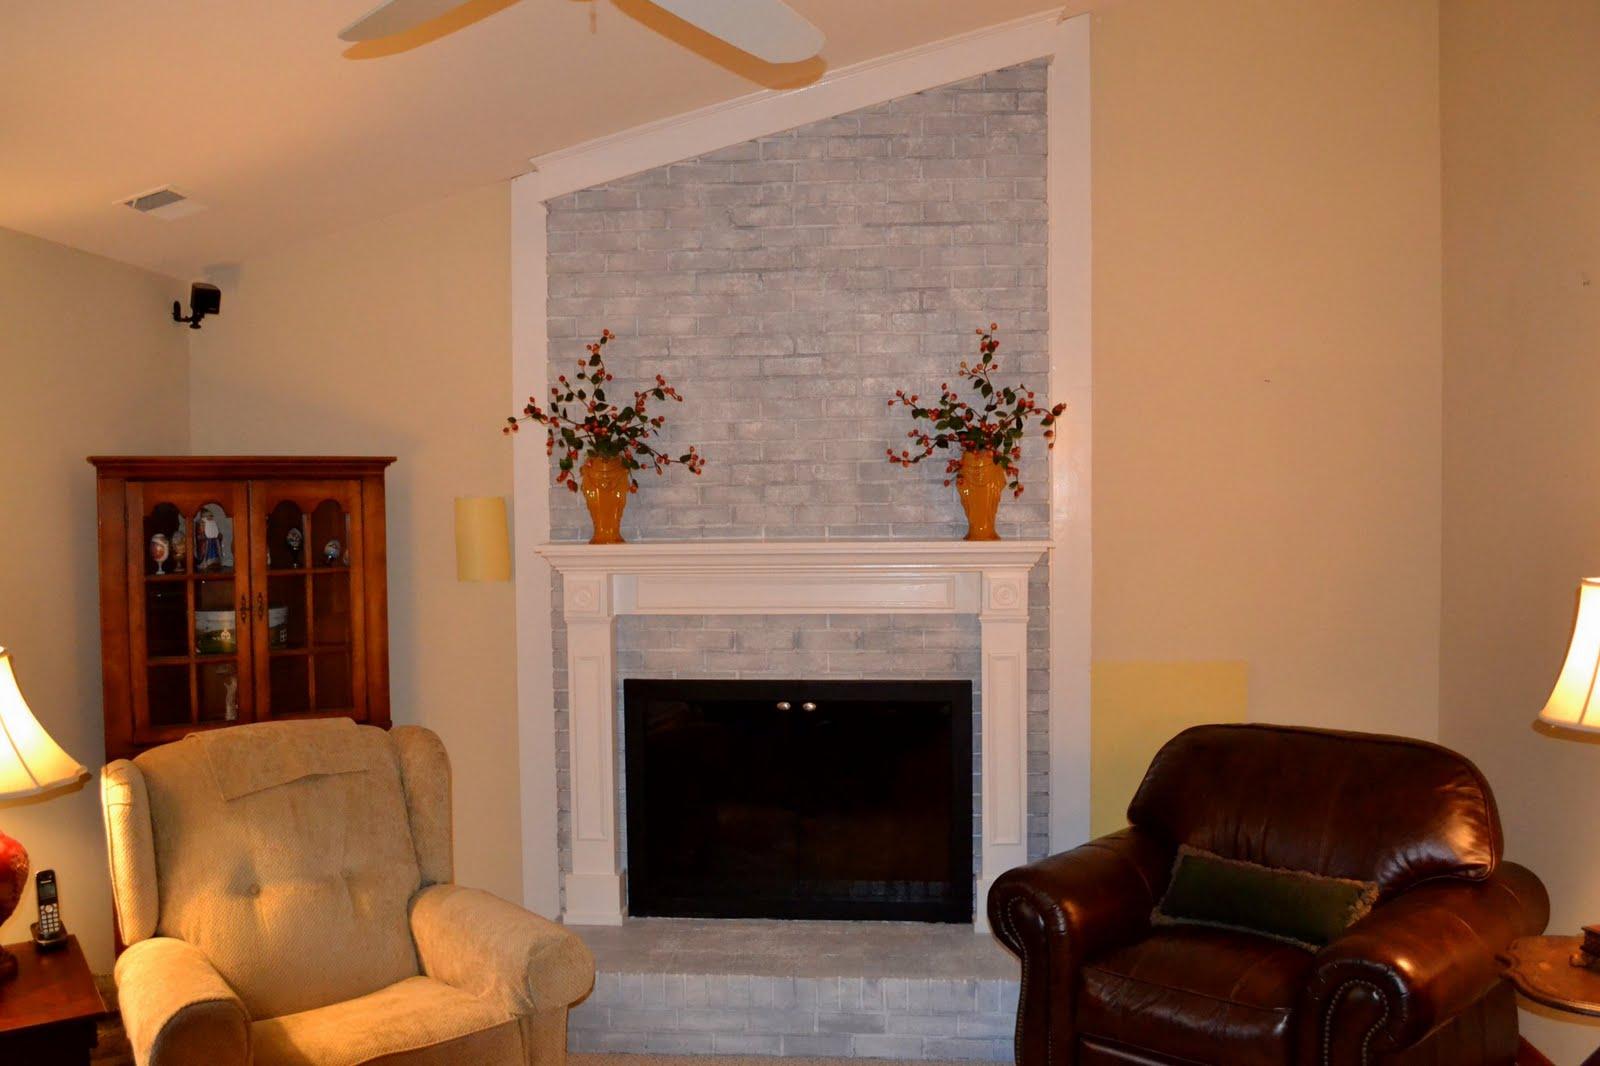 Redesign more interior redesign design home - Interior design firms in charlotte nc ...